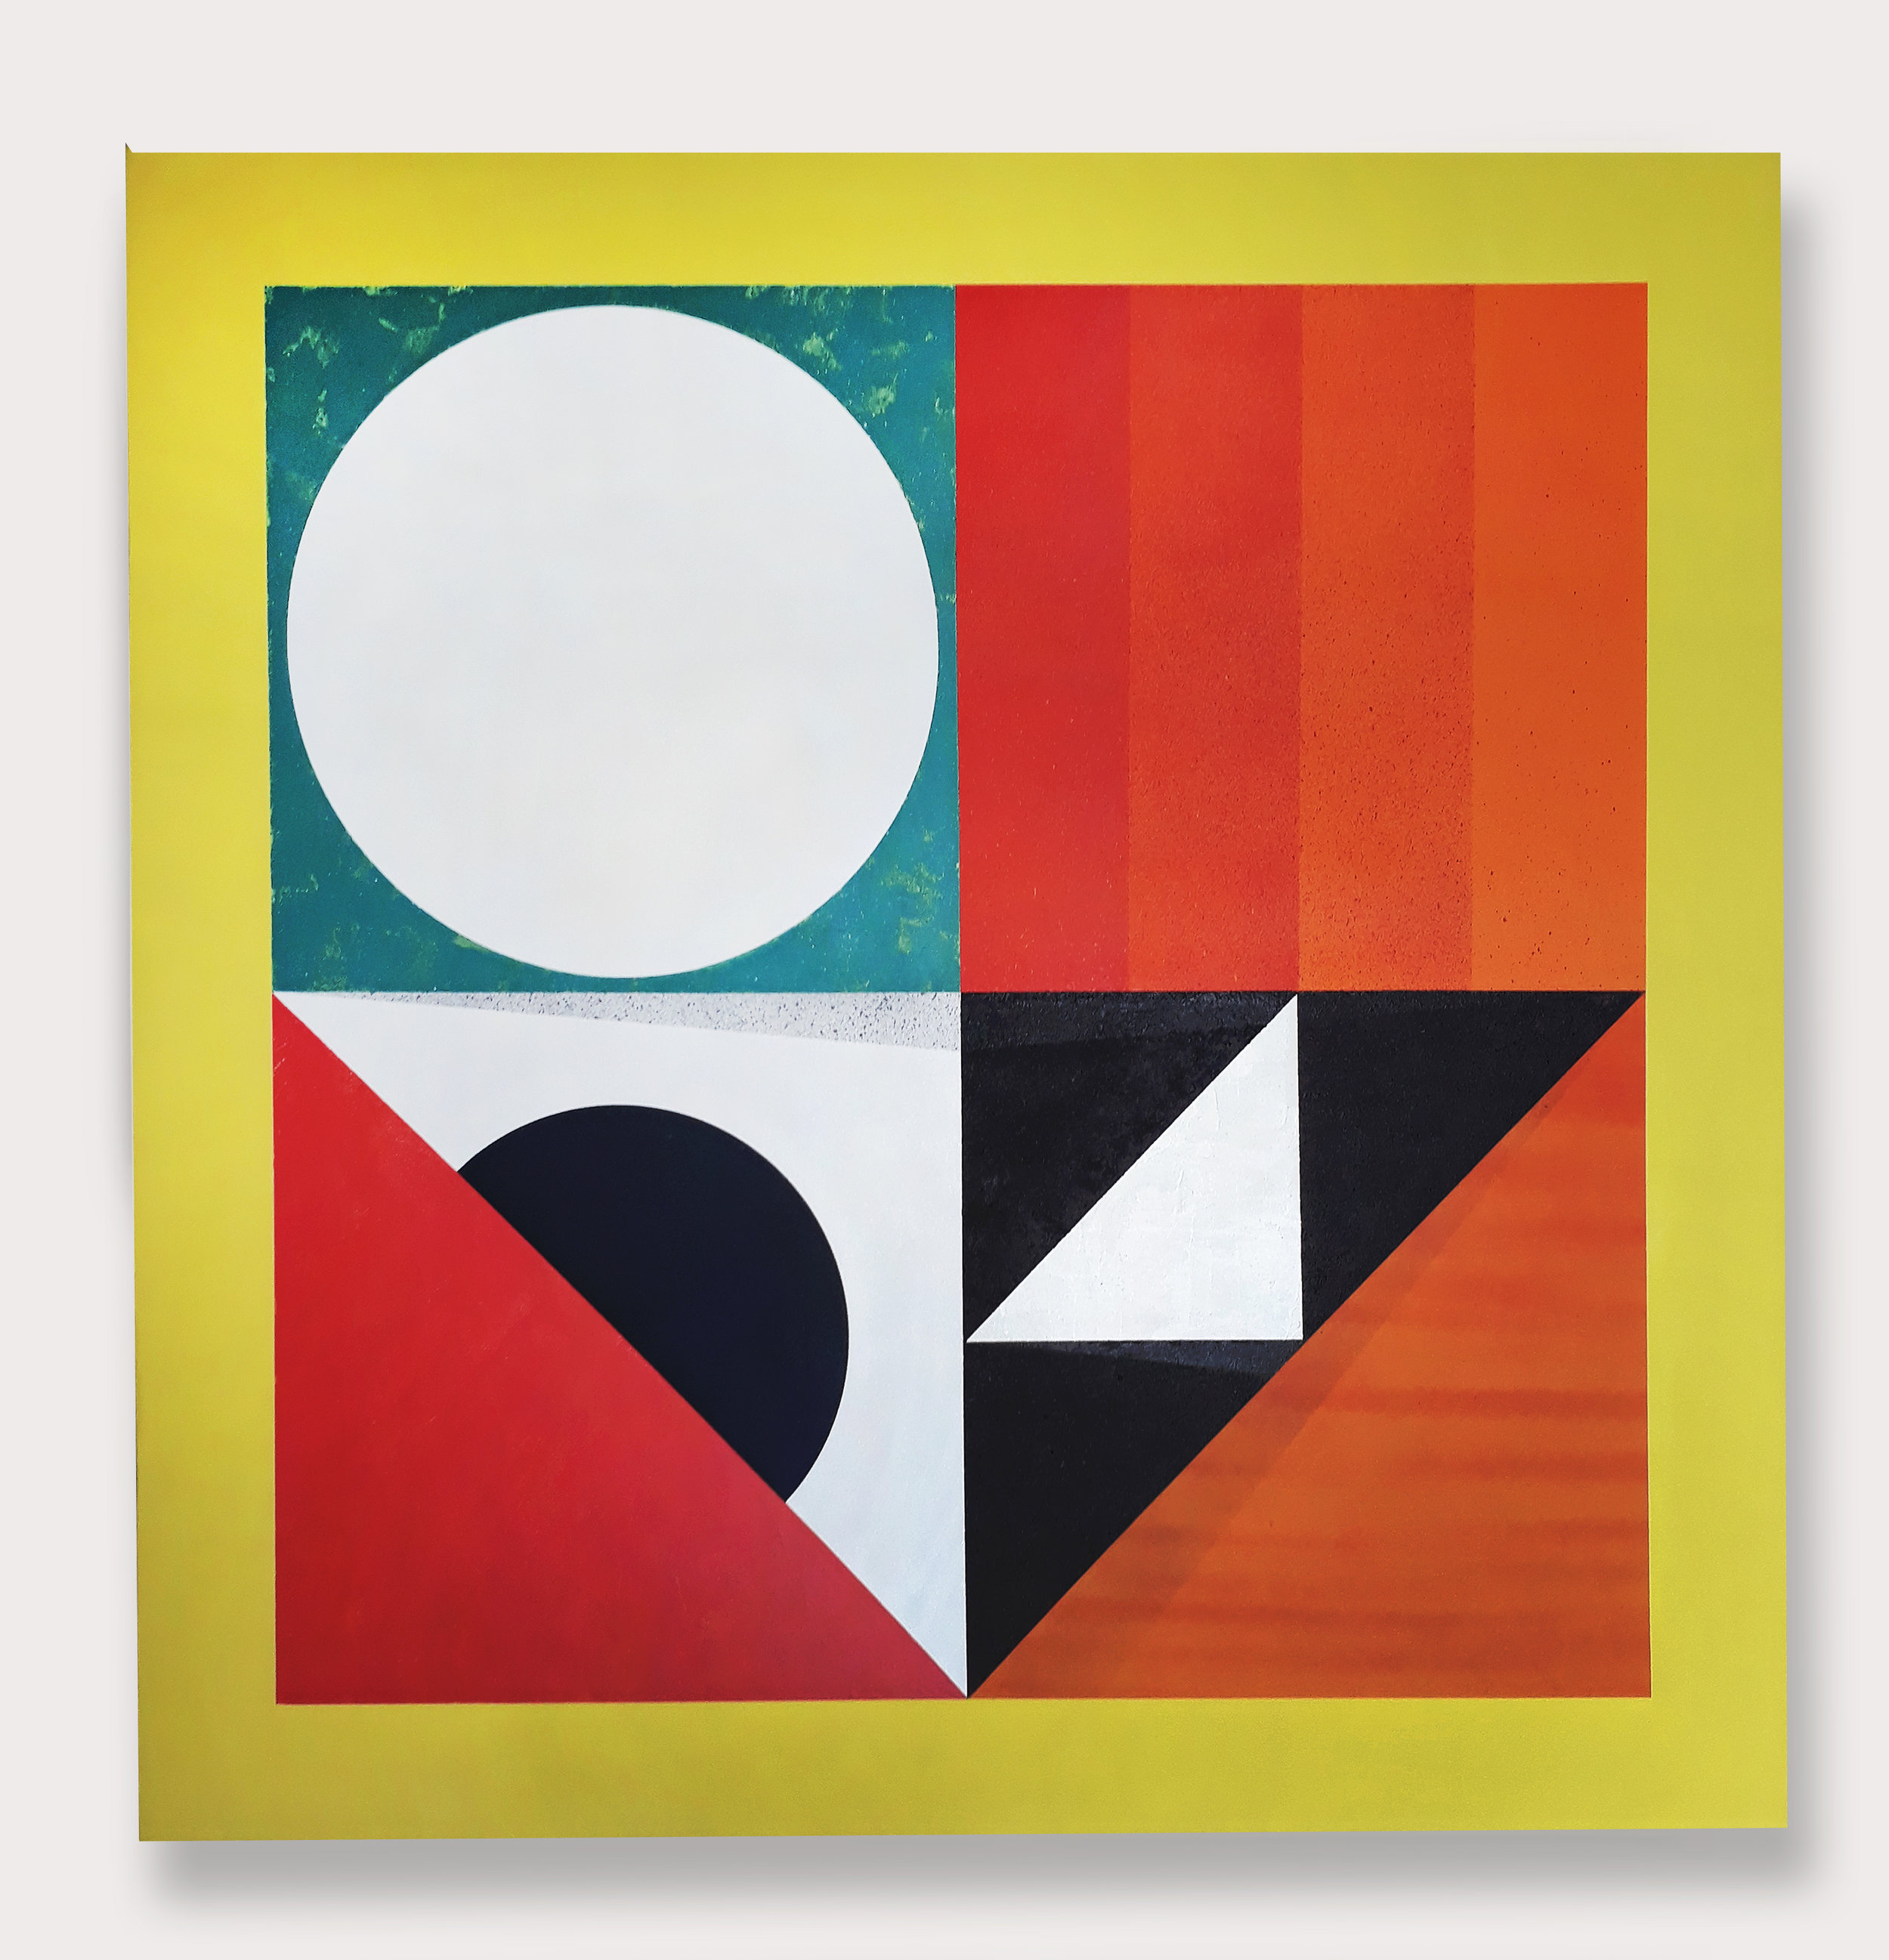 Phase (2019) -  120 x 120 cm- Aerosol y pintura acrílica sobre lienzo  /Spray paint and acrylic on canvas